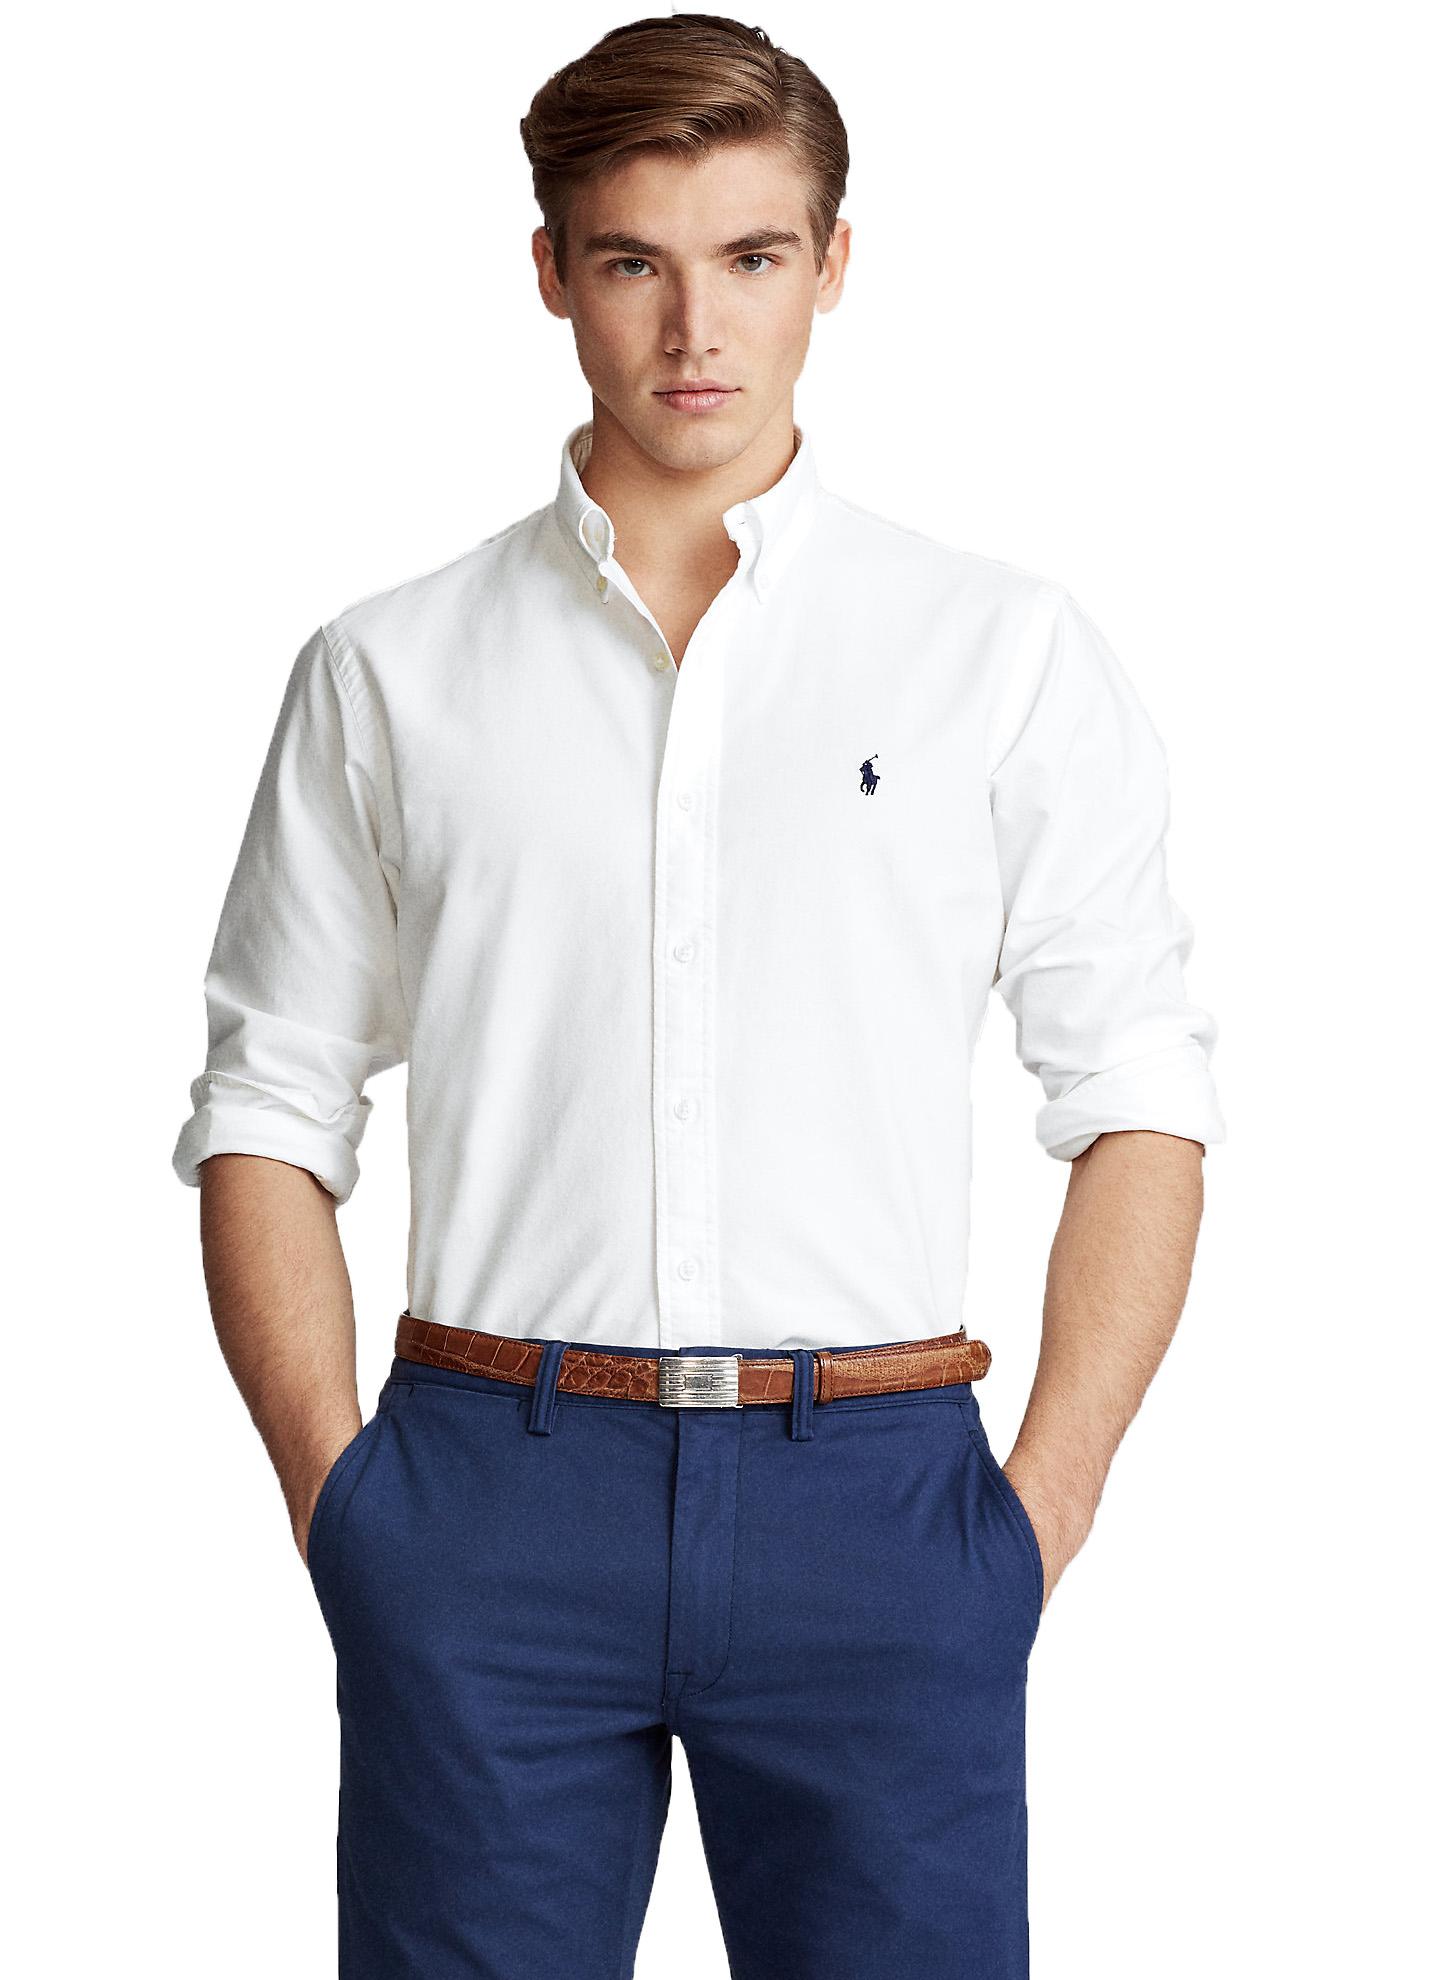 Camisa Ralph Lauren Masculina Custom Fit Algodão Oxford Branco